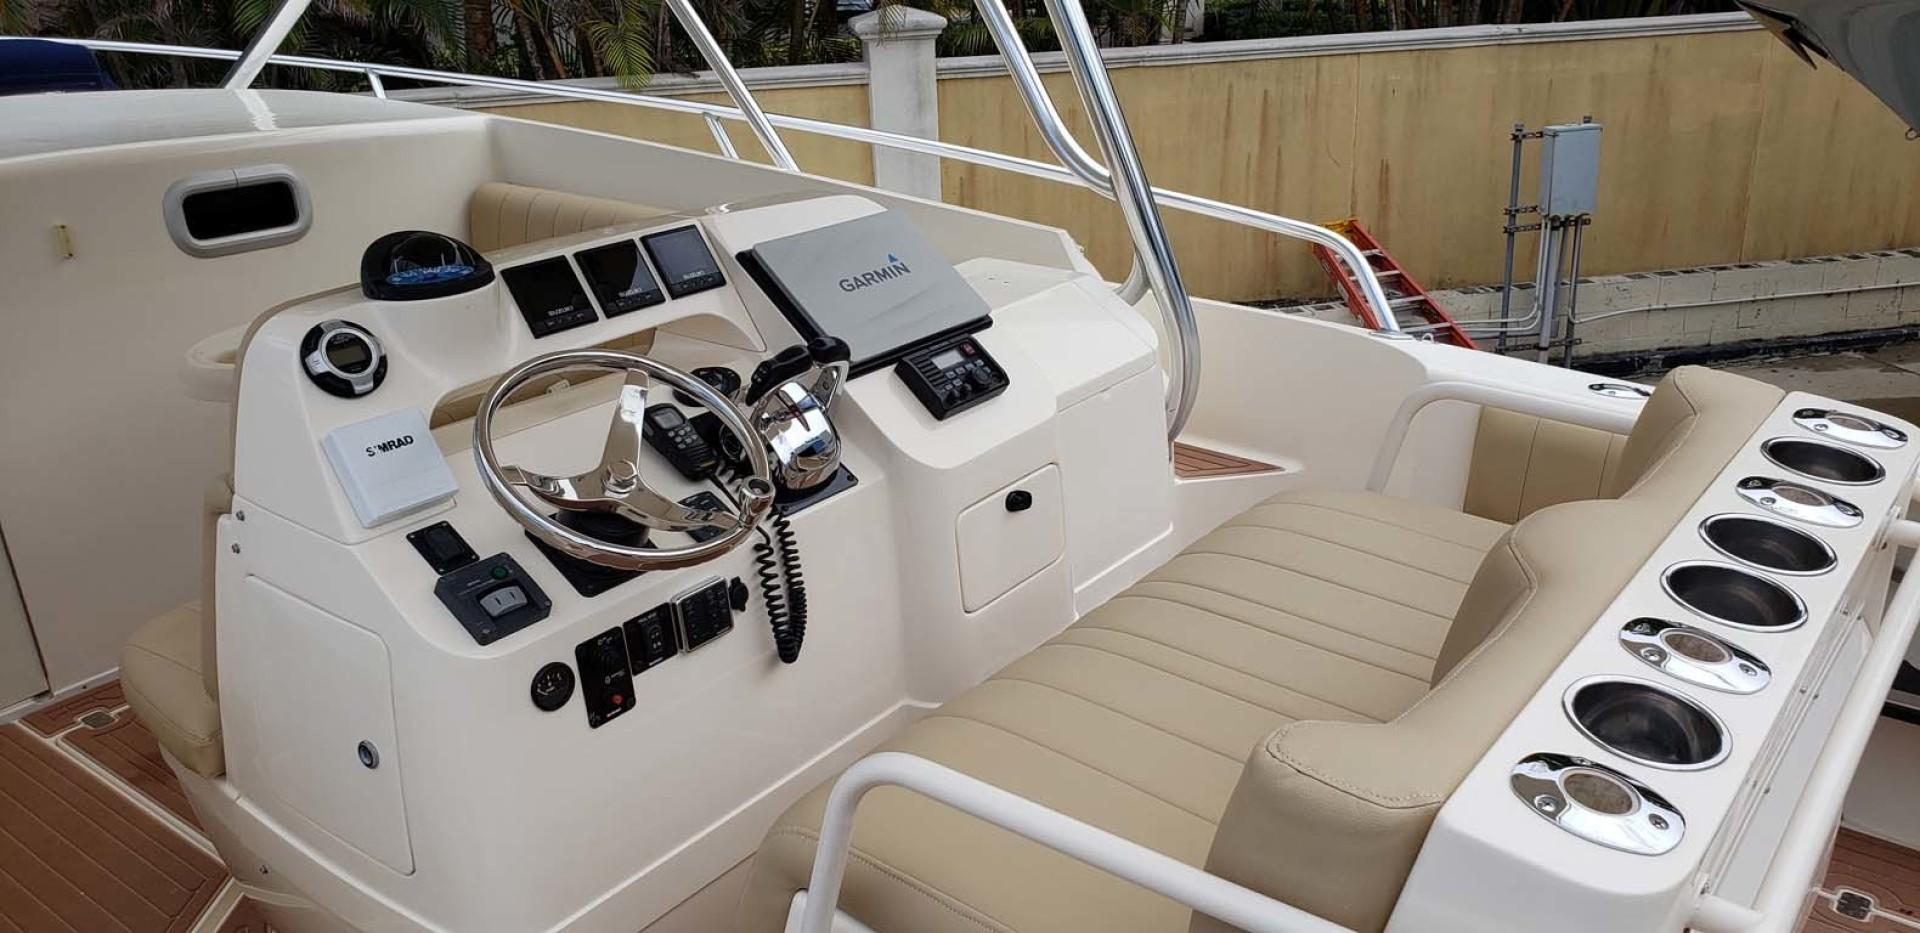 Intrepid-348 Walkaround 2003 -West Palm Beach-Florida-United States-1428842 | Thumbnail